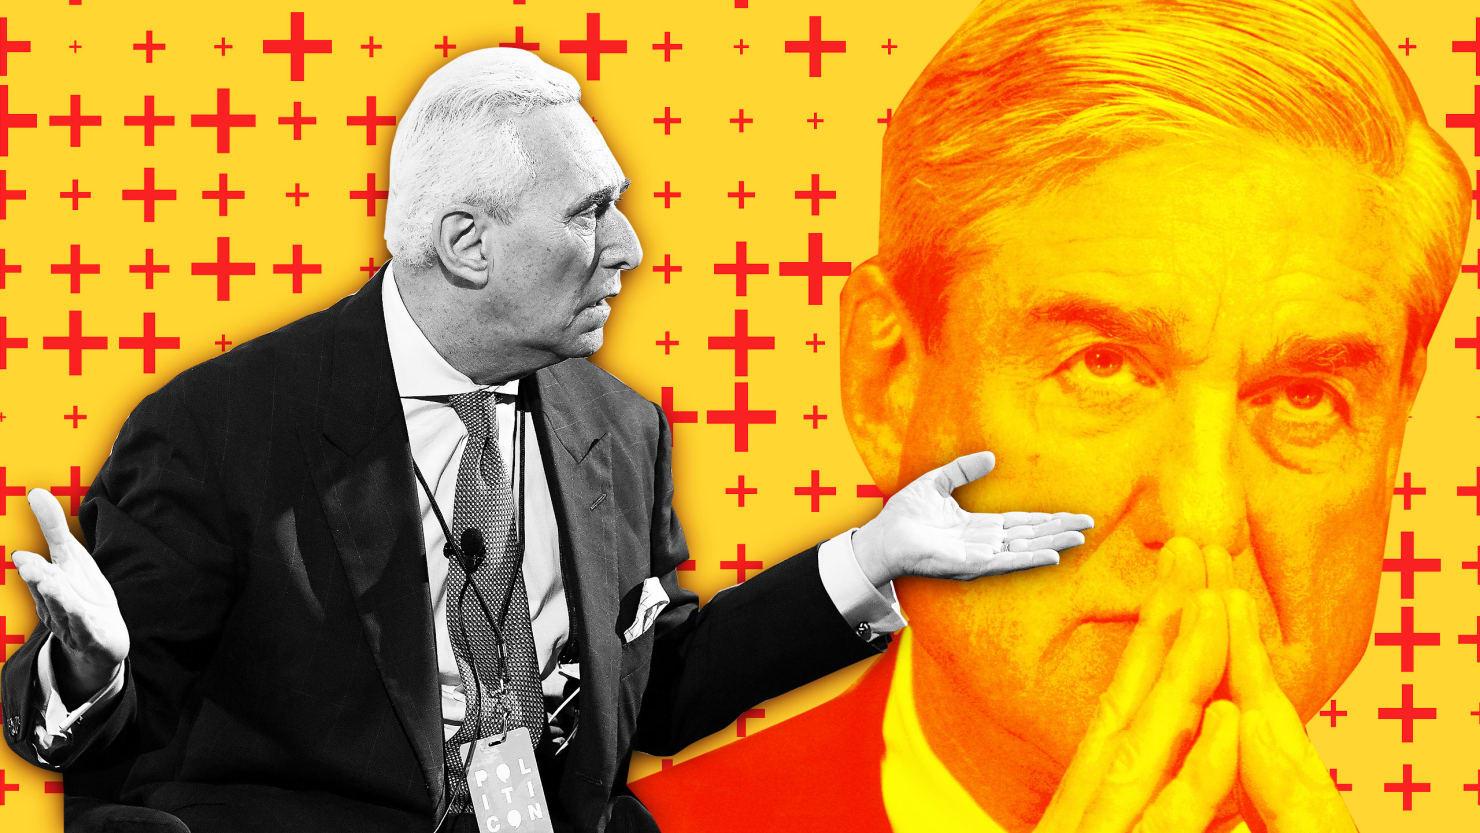 Roger Stone ally challenges Mueller subpoena